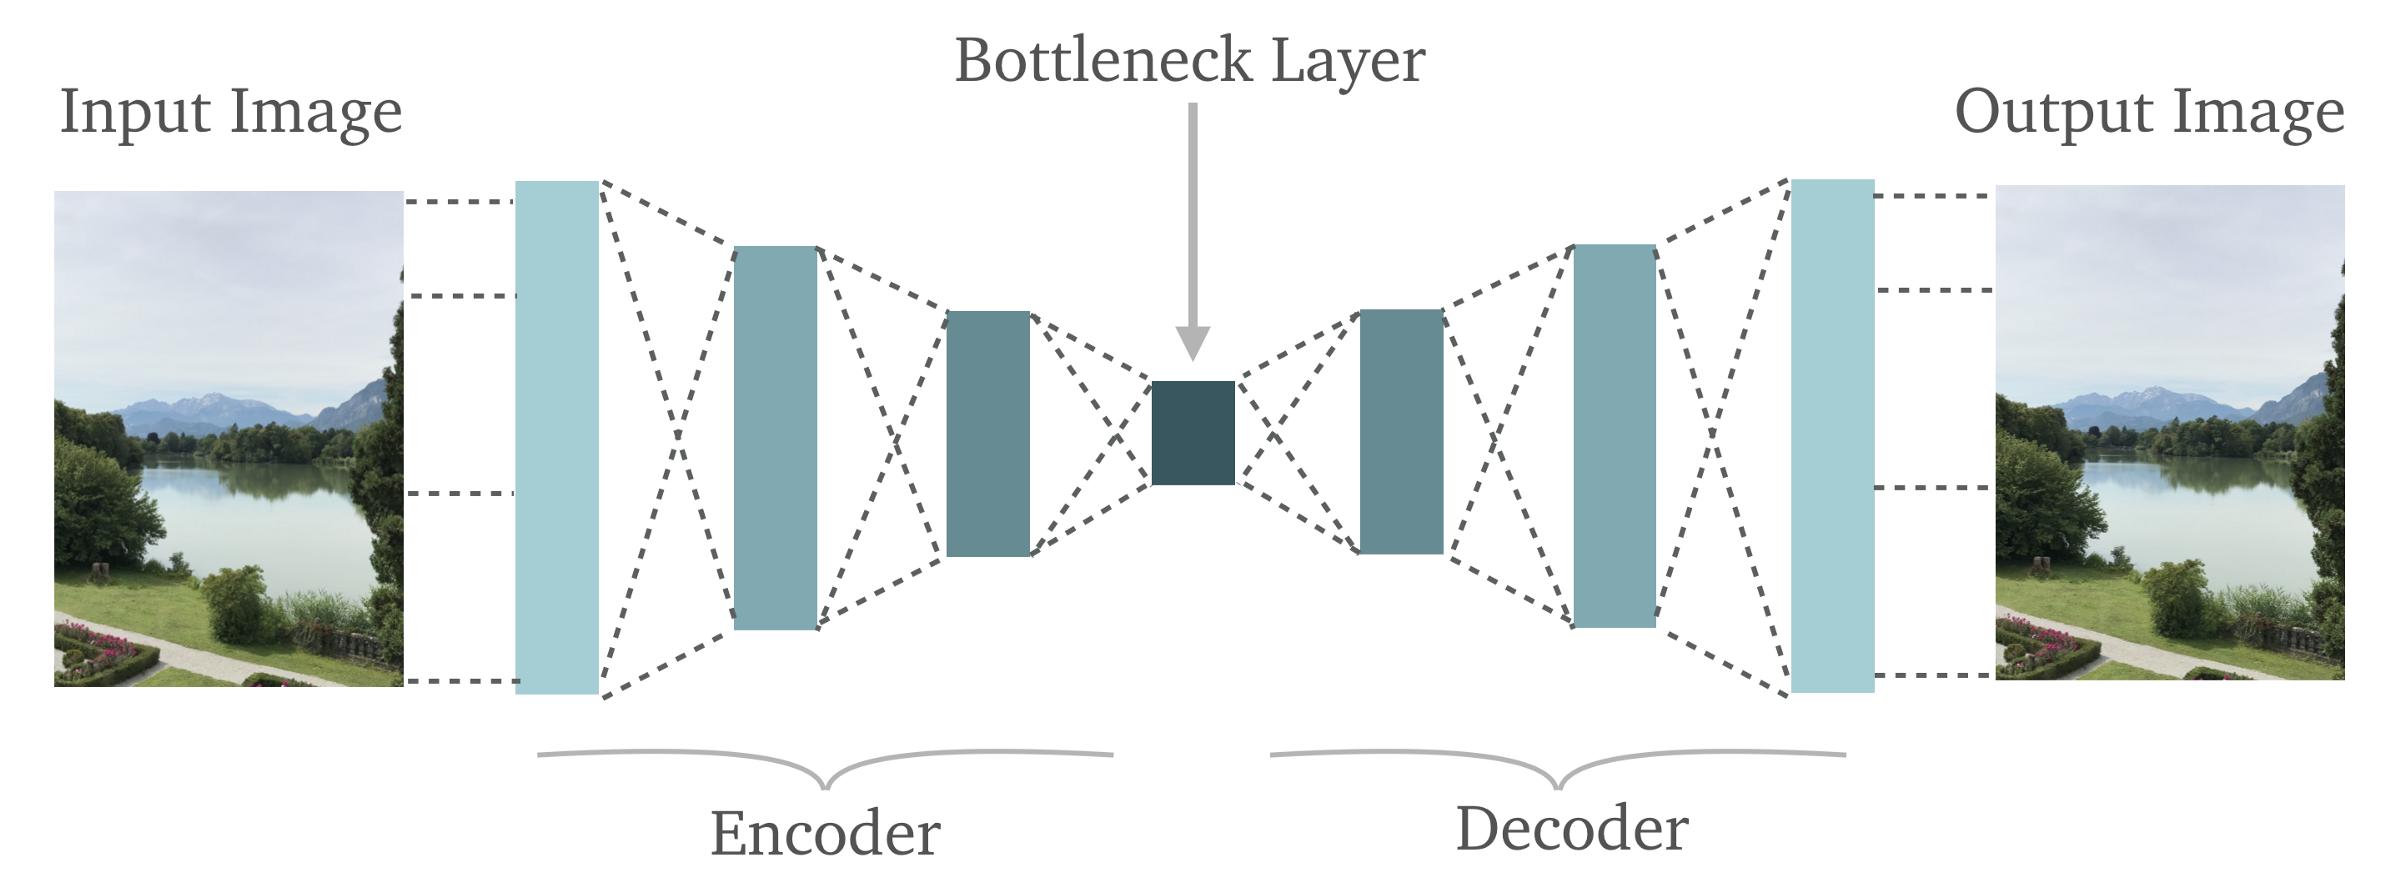 A Deep Convolutional Denoising Autoencoder for Image Classification